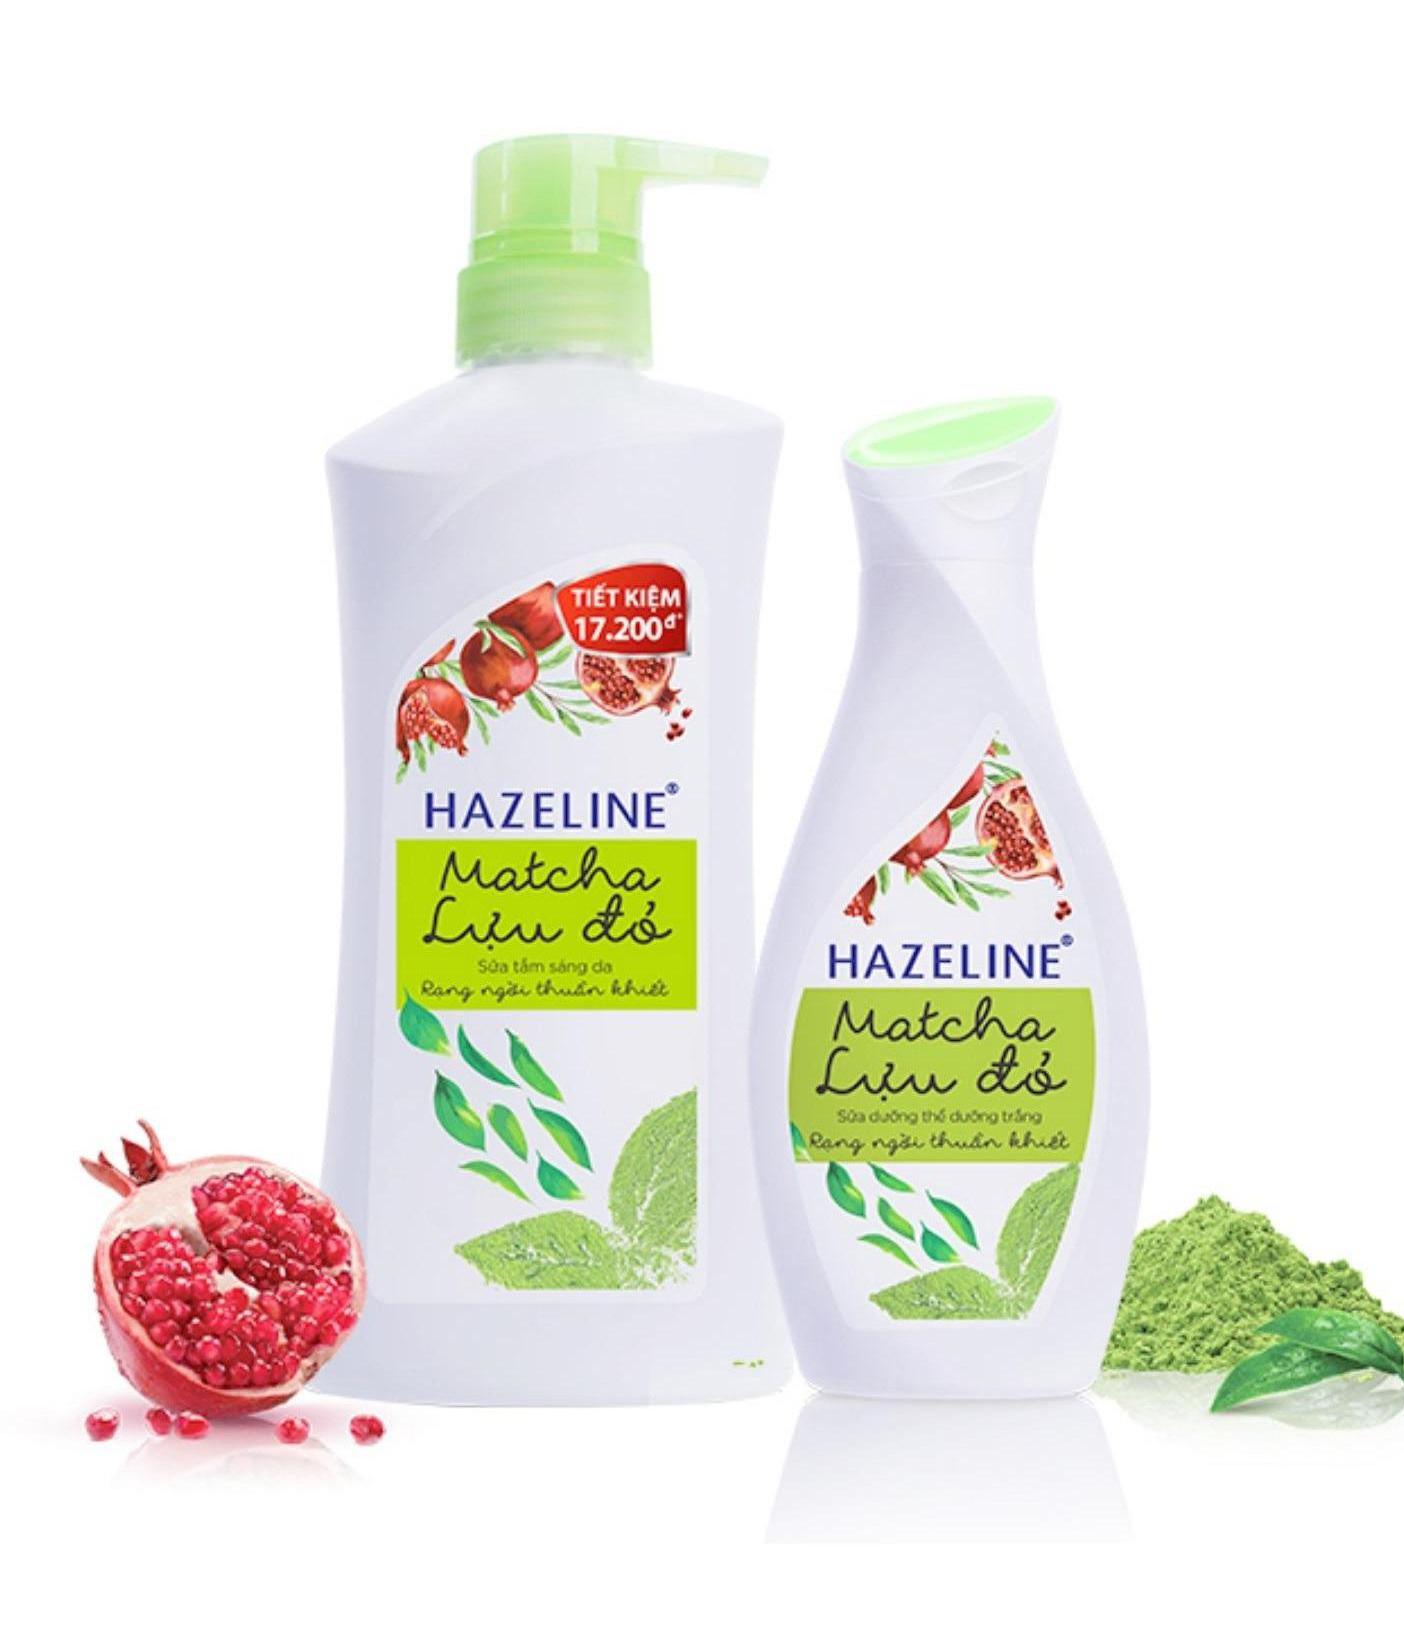 Đôi nét về sữa dưỡng thể Hazeline